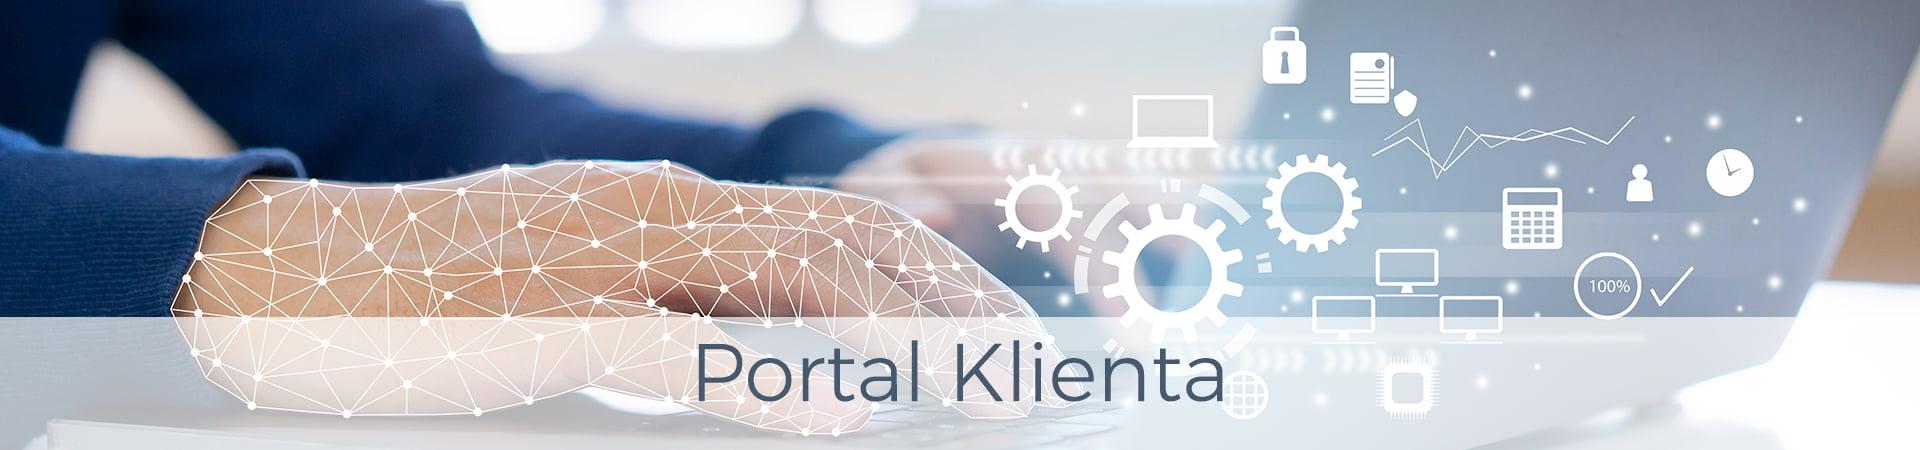 Portal klienta